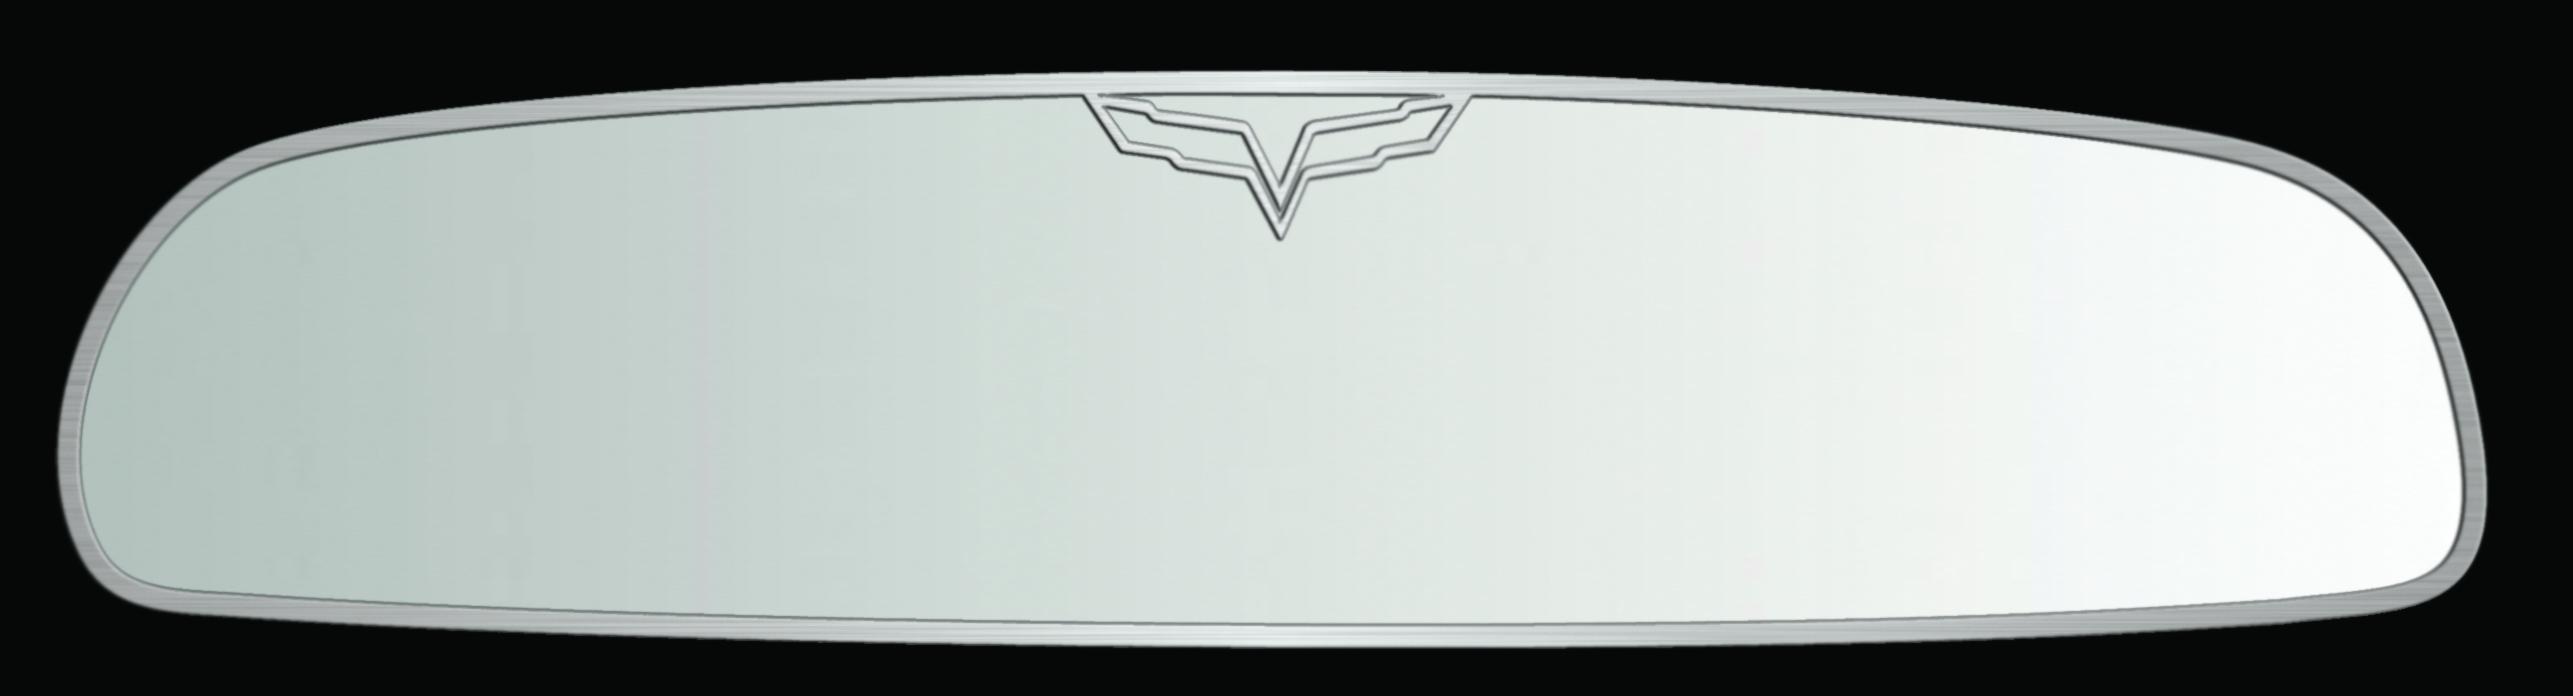 Mirror Trim Rear View Crossed Flags Style Trim Auto Dim GML |2005-2013 Chevrolet Corvette